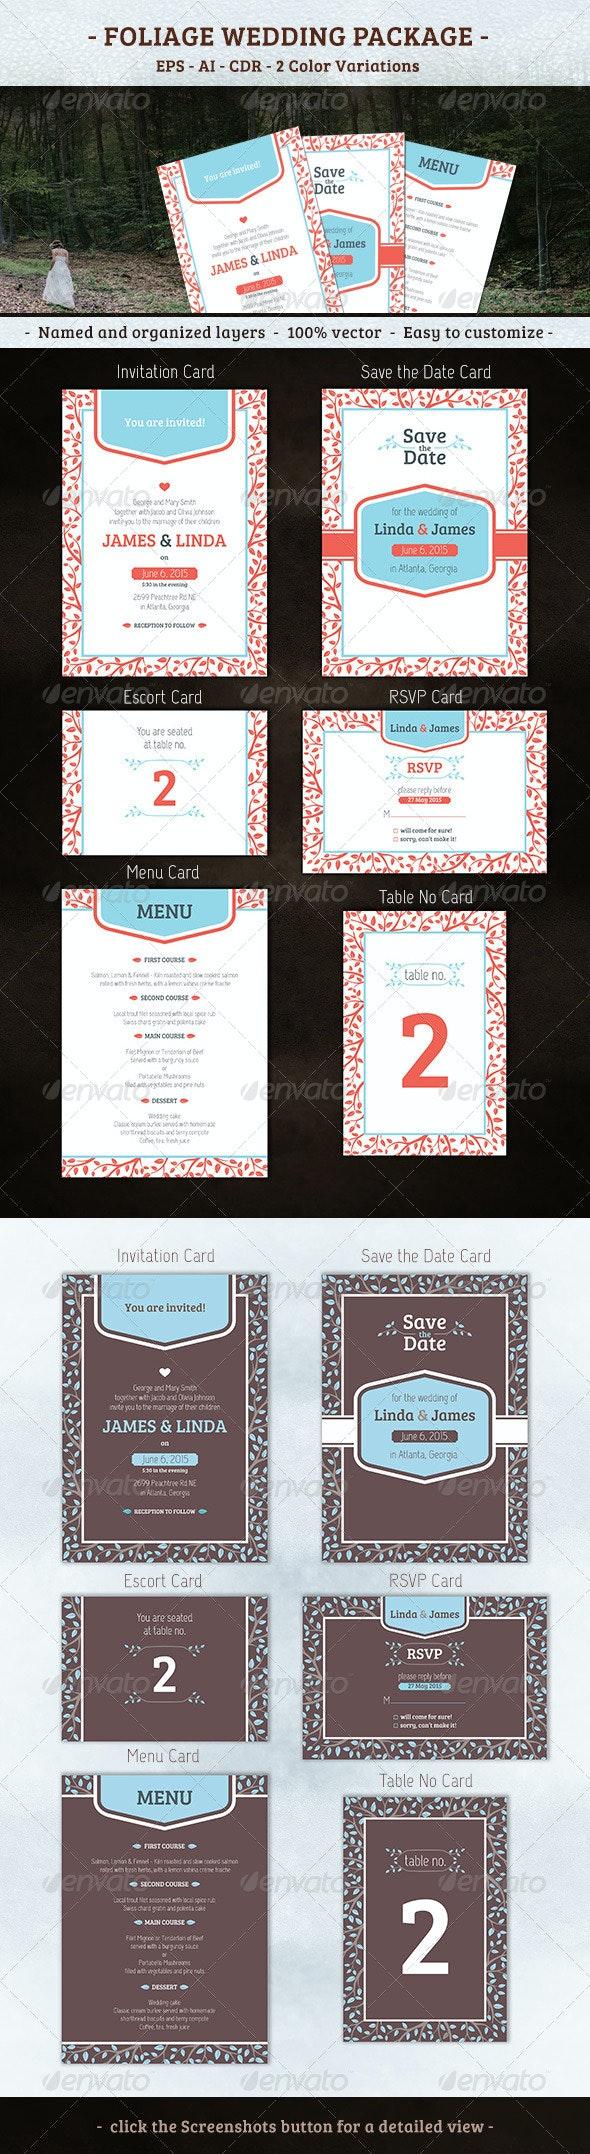 Foliage Wedding Package - Weddings Cards & Invites